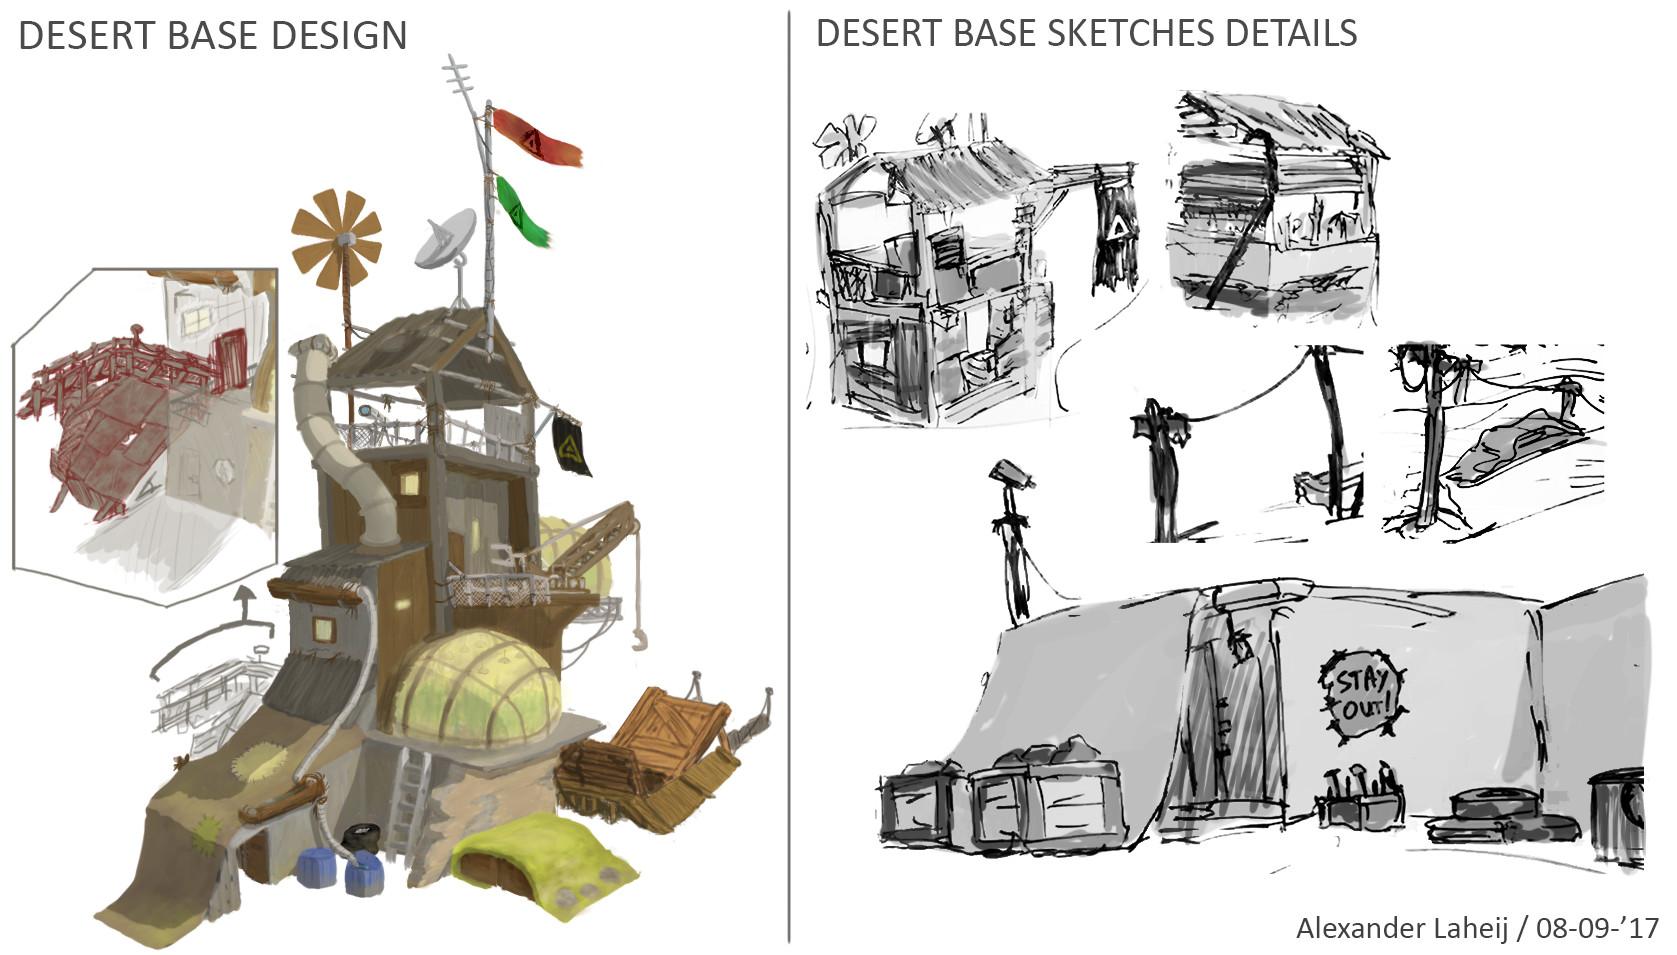 Alexander laheij concept desert base design clean